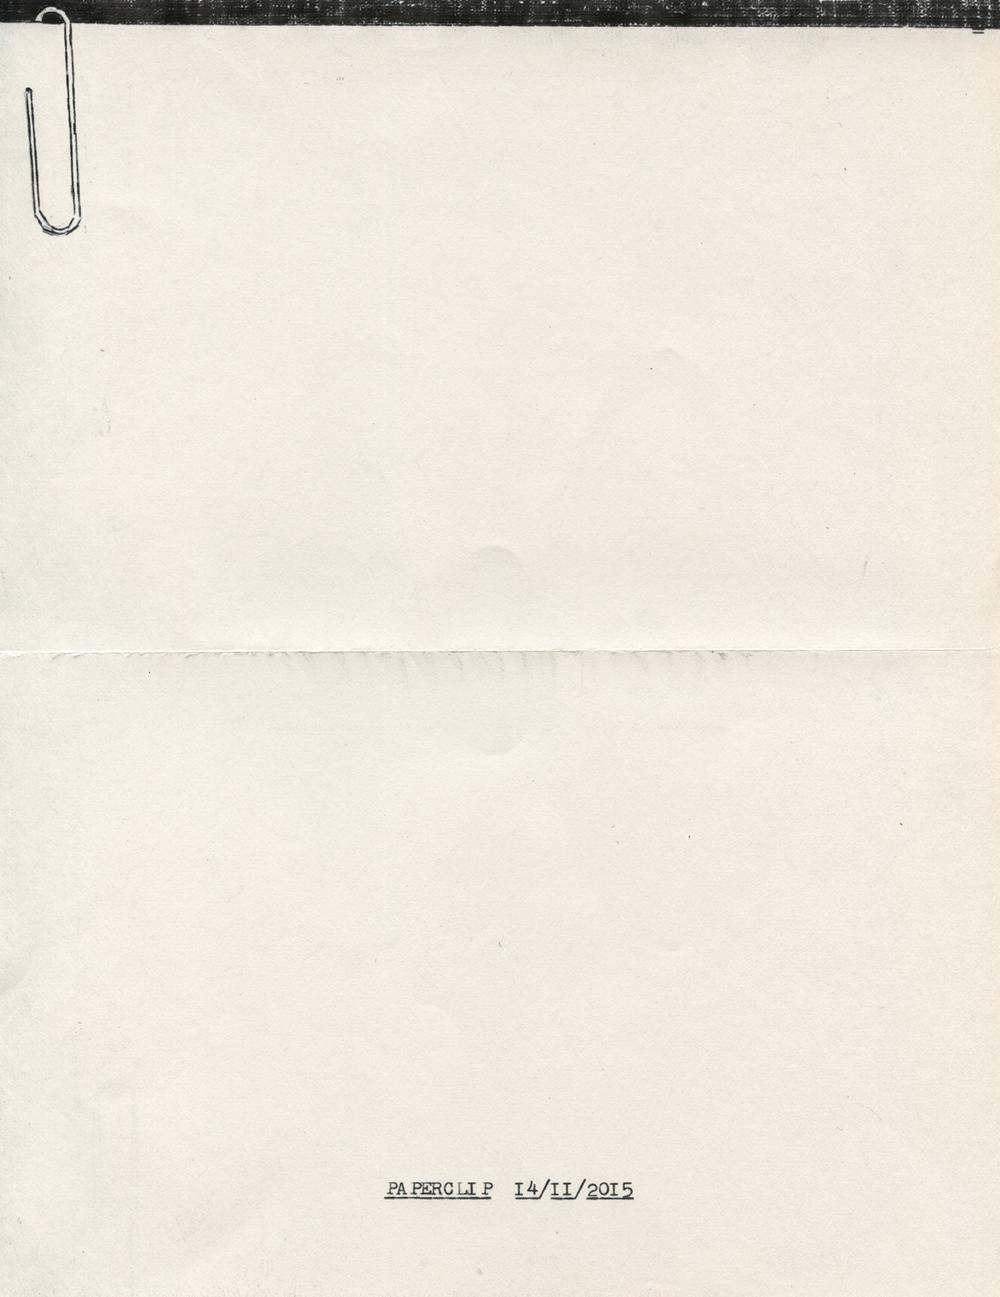 tw_14_11_2015_paperclip.jpg